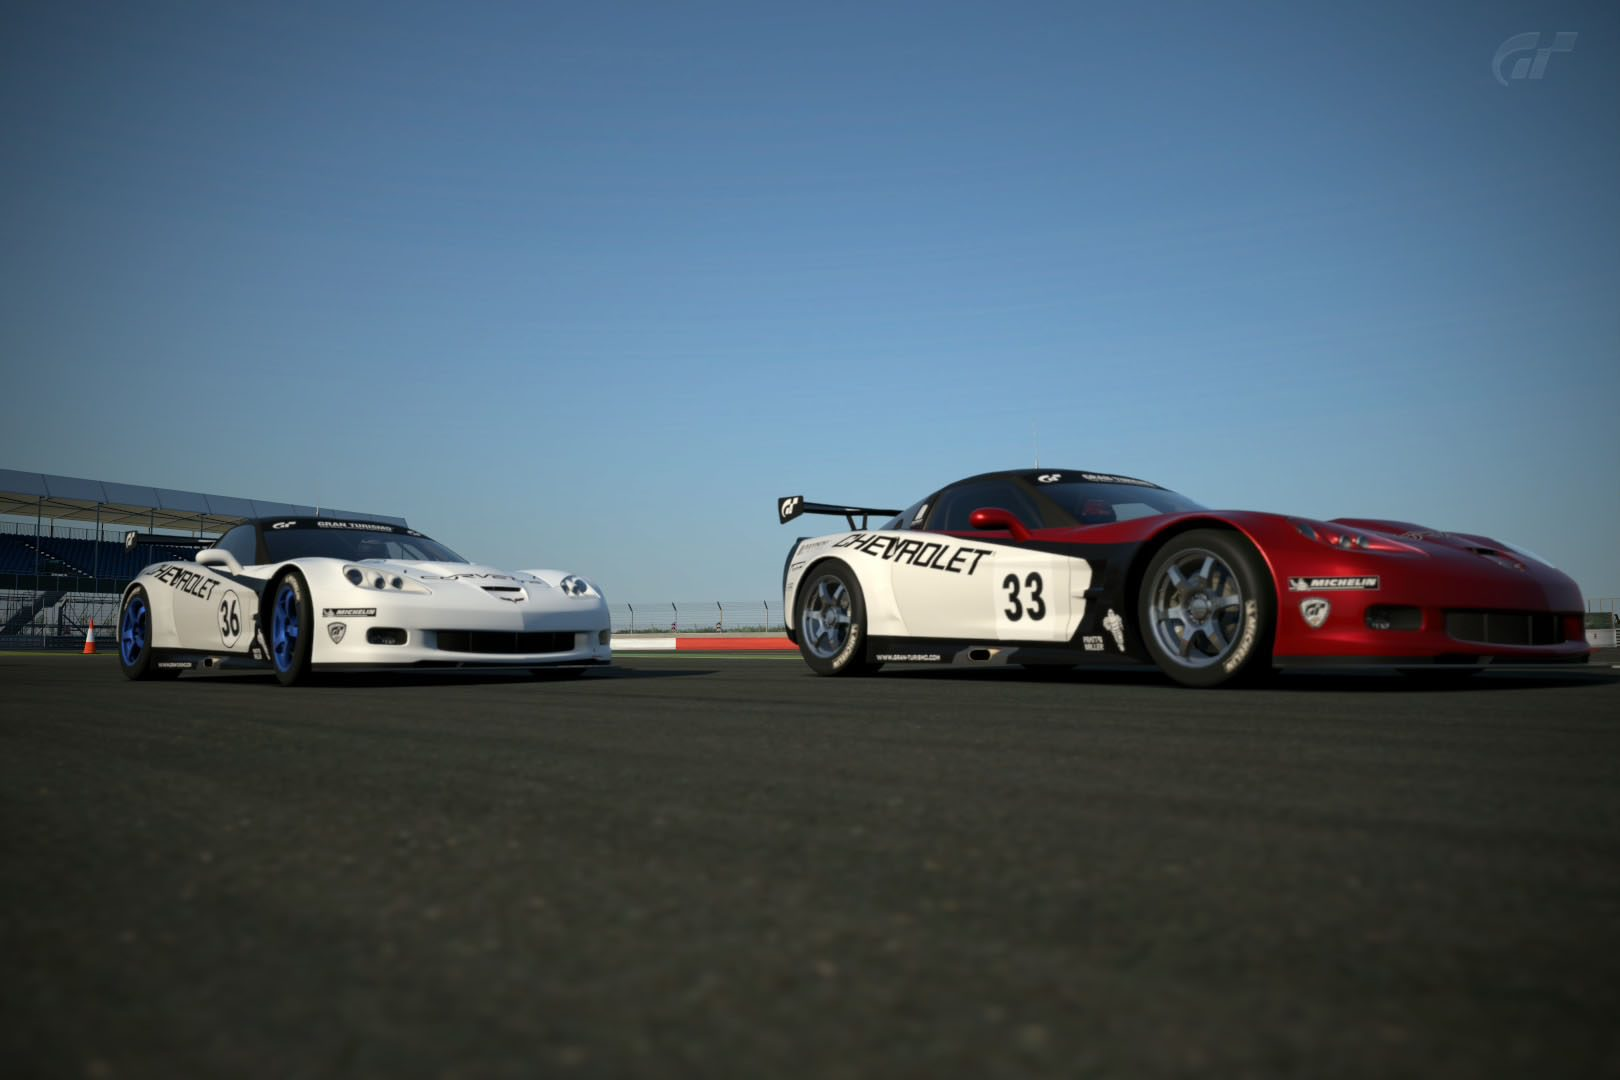 Silverstone Grand Prix Circuit33 36.jpg